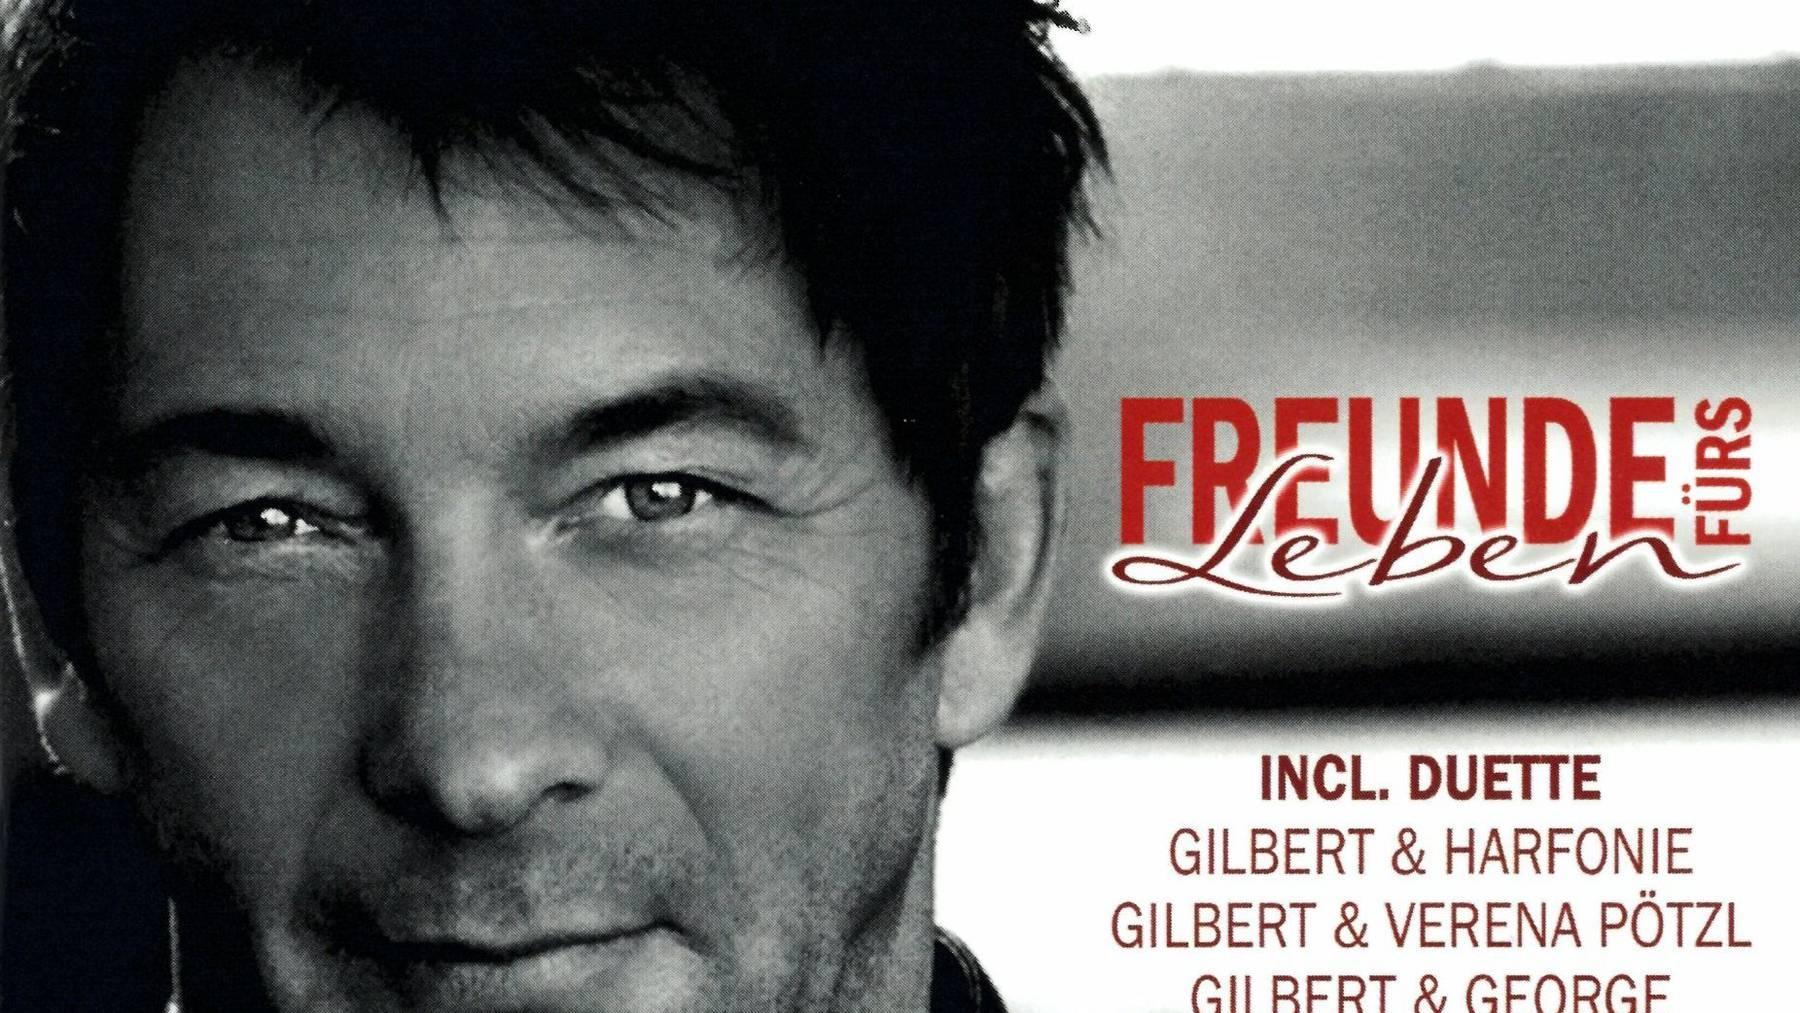 CD Cover / Manfred Esser